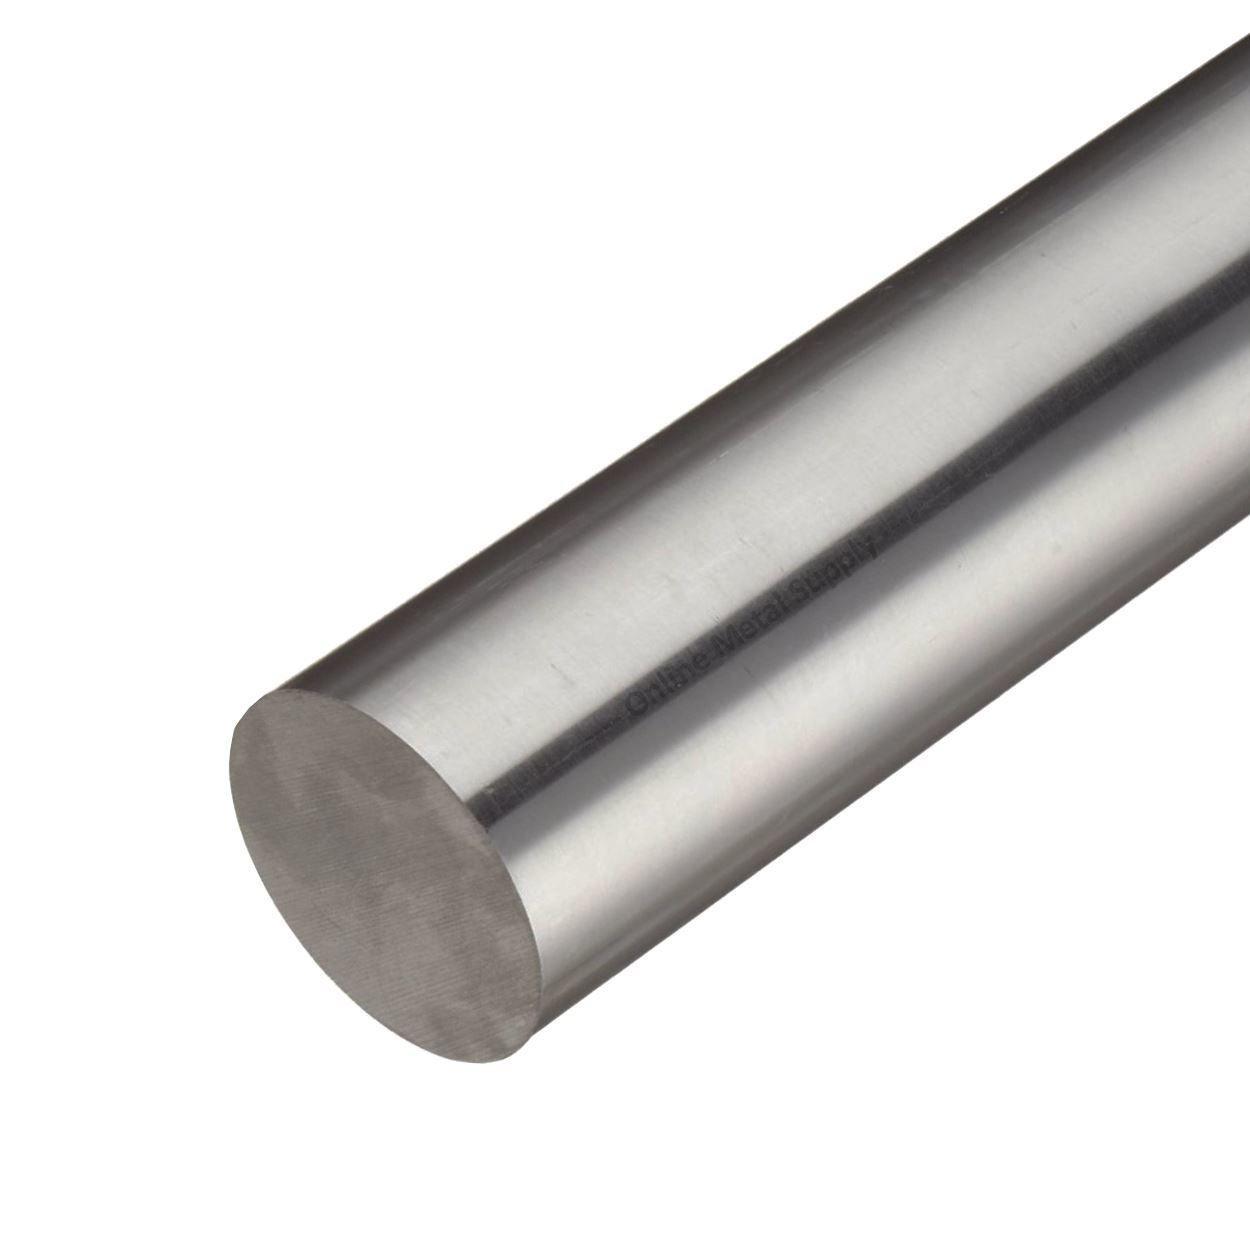 Online Metal Supply Alloy 718 Nickel Round Rod, 1.250 (1-1/4 inch) x 3 inches